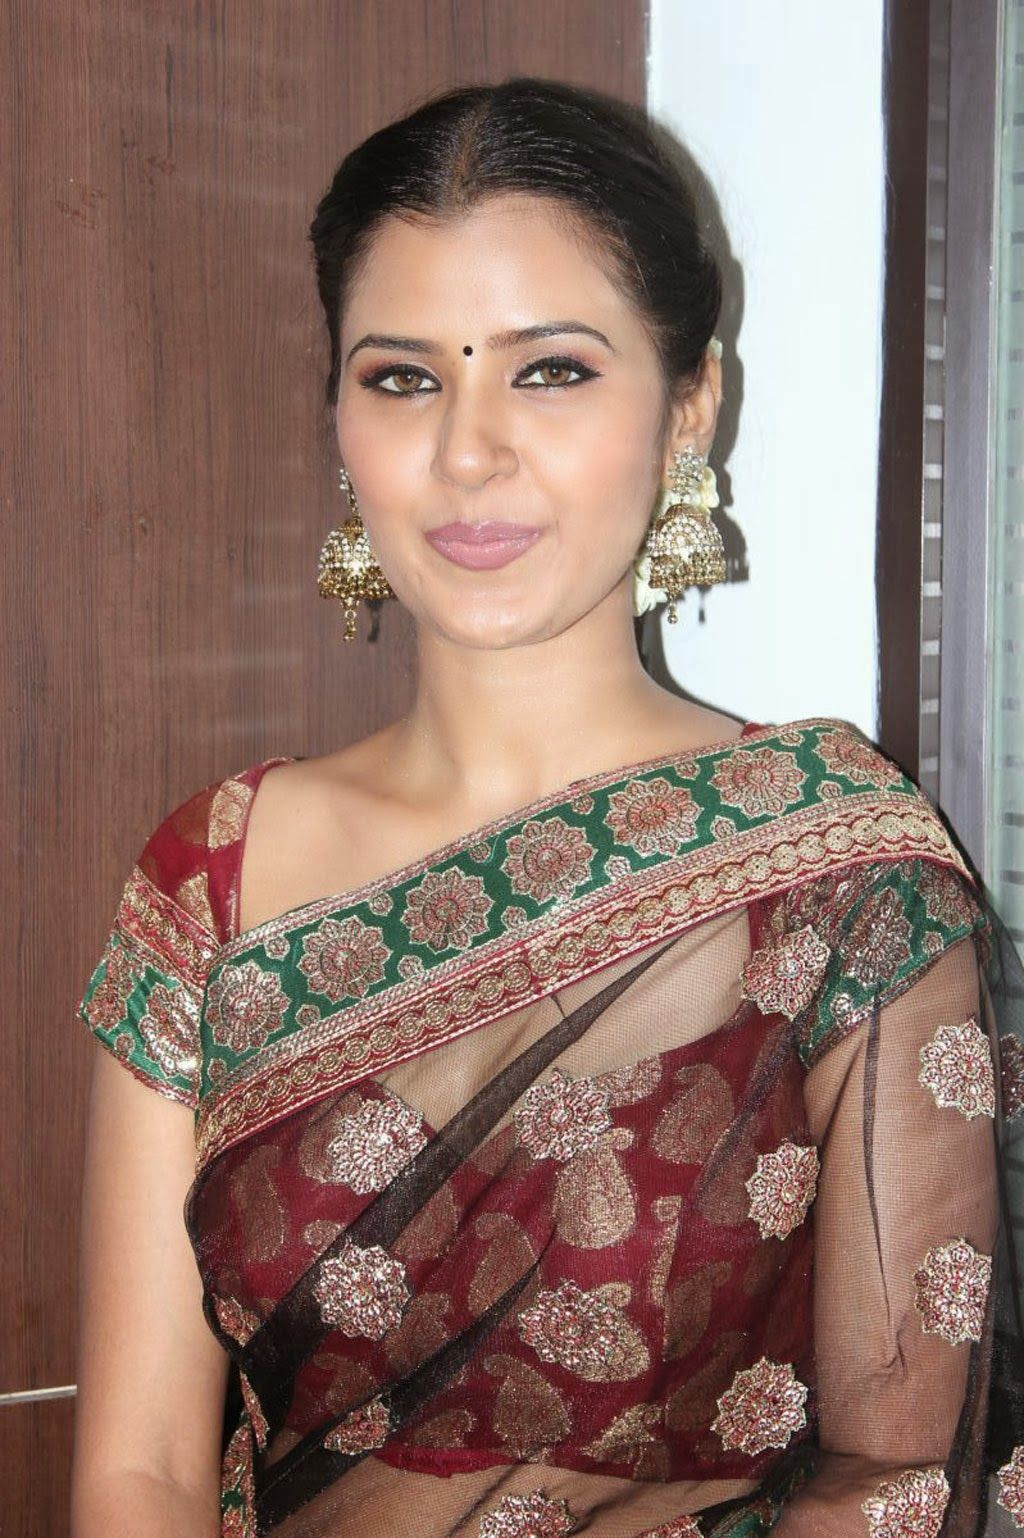 Jennifer Photos in Saree at Ravana Desam Audio Launch more @ http://luvcelebs.com